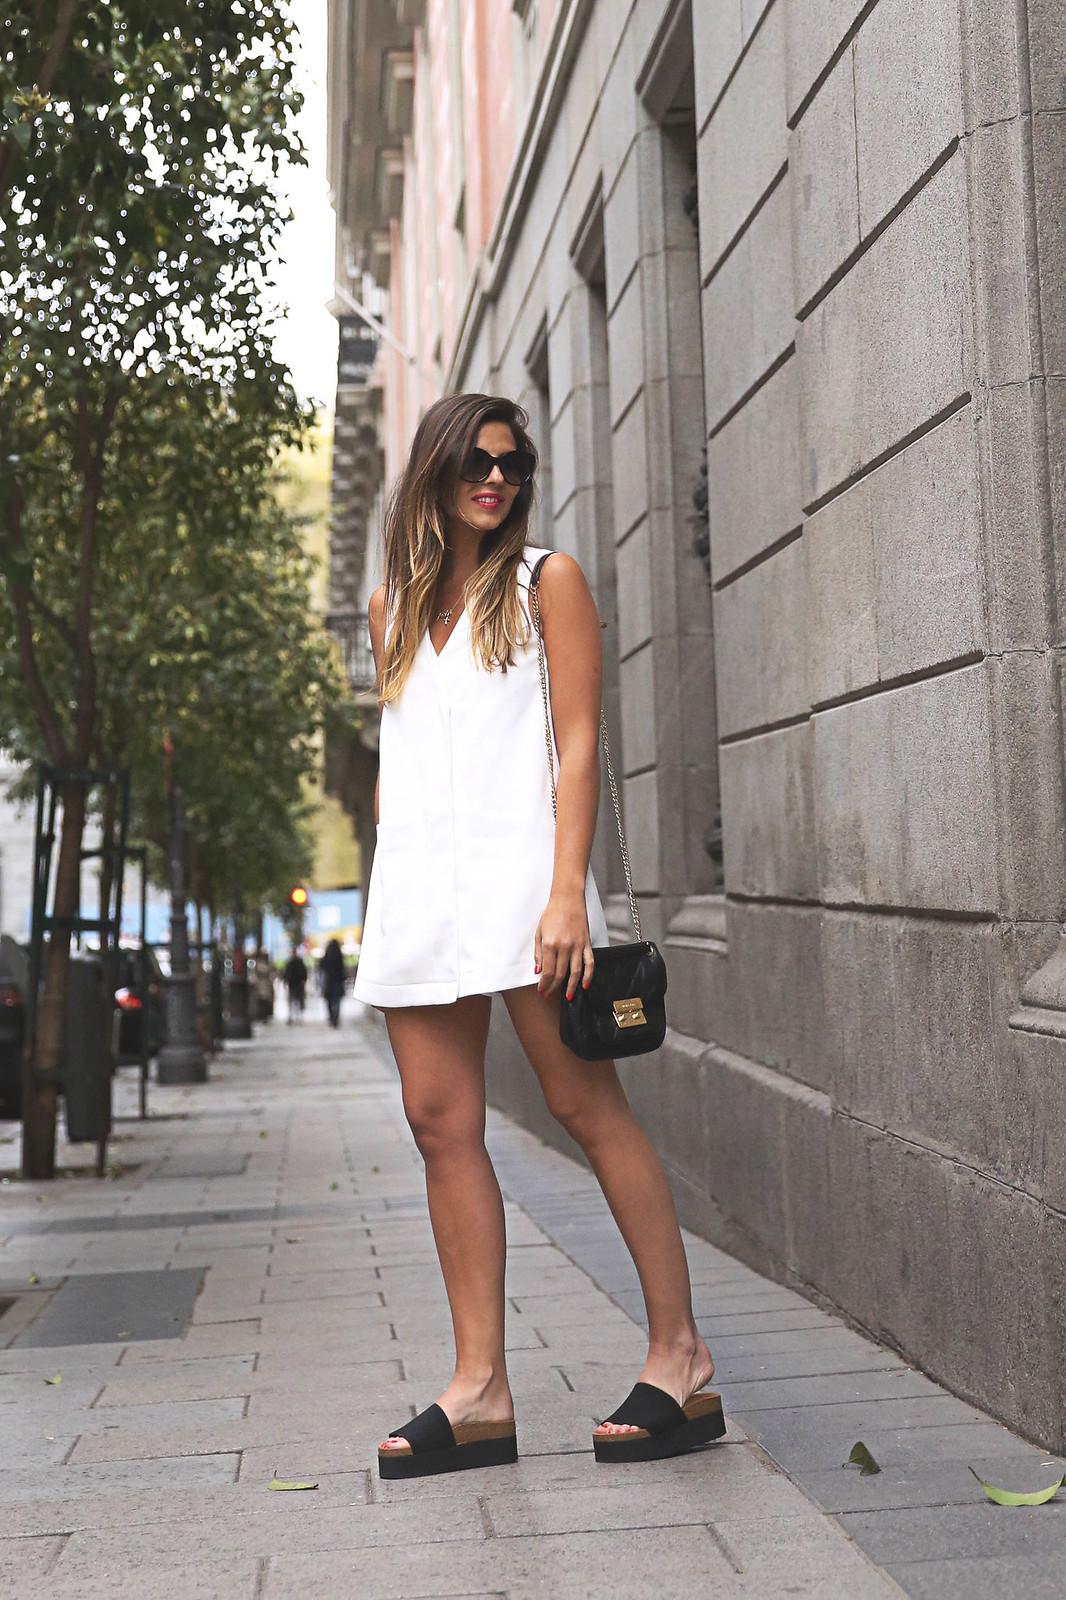 trendy-taste-look-outfit-street-style-ootd-blog-blogger-fashion-spain-moda-españa-steve-madden-mono-overall-playsuit-sandalias-michael-kors-white-blanco-2